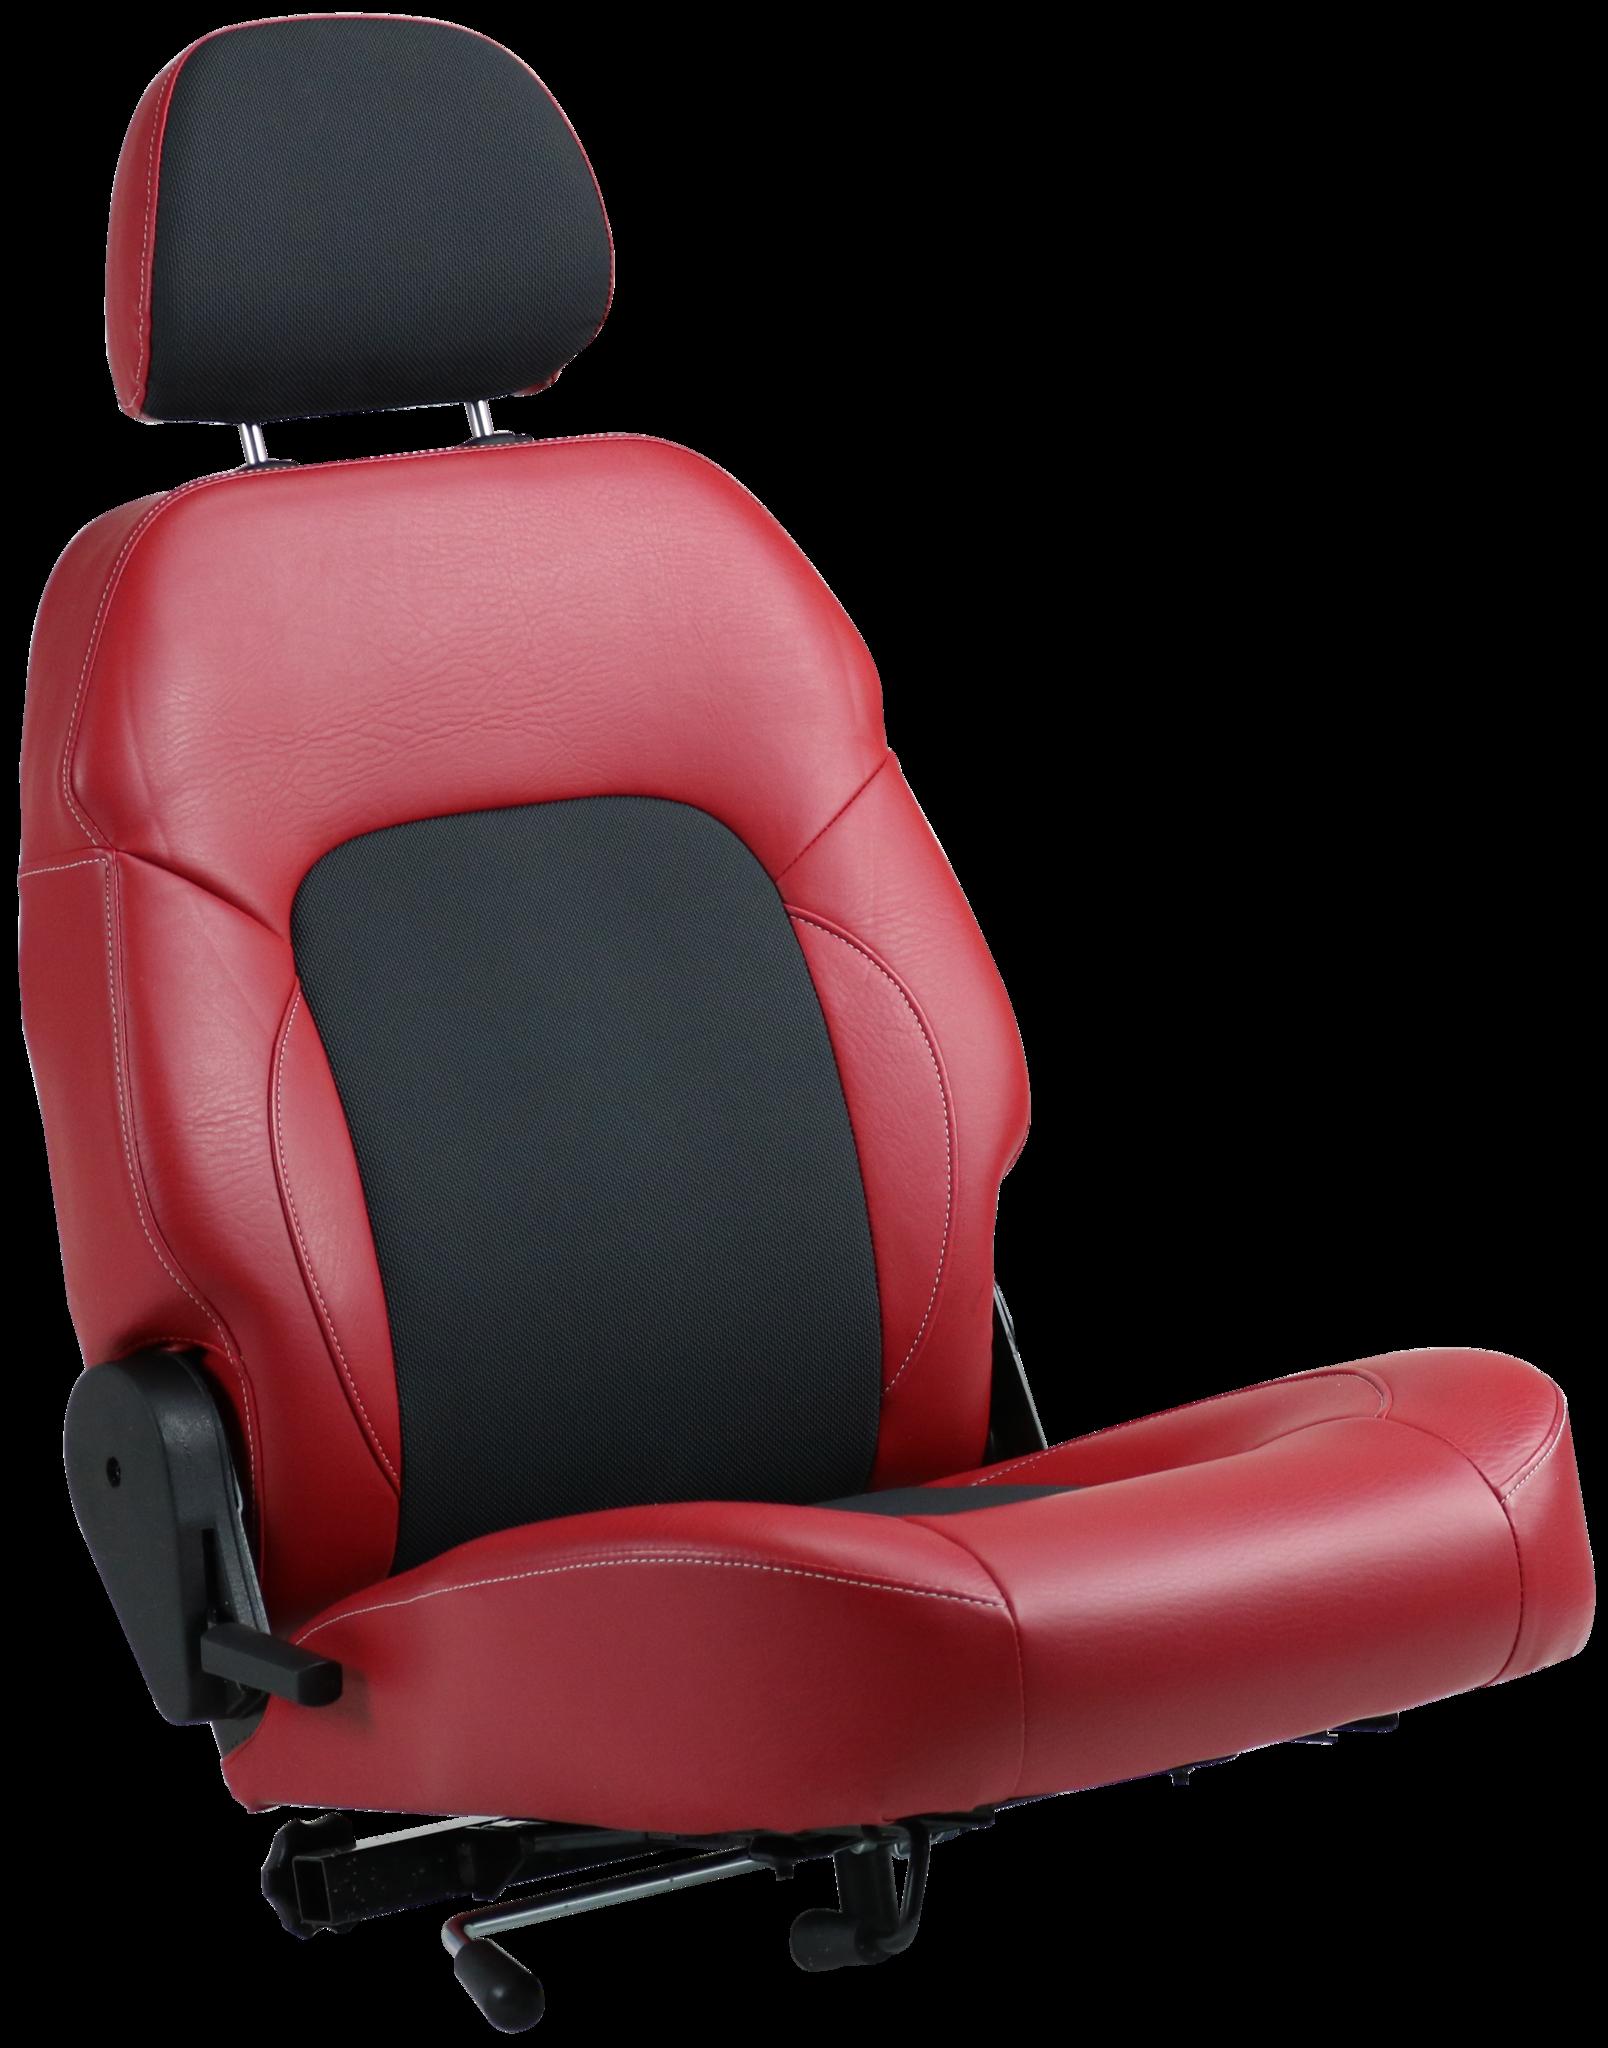 scootmobiel stoel rood